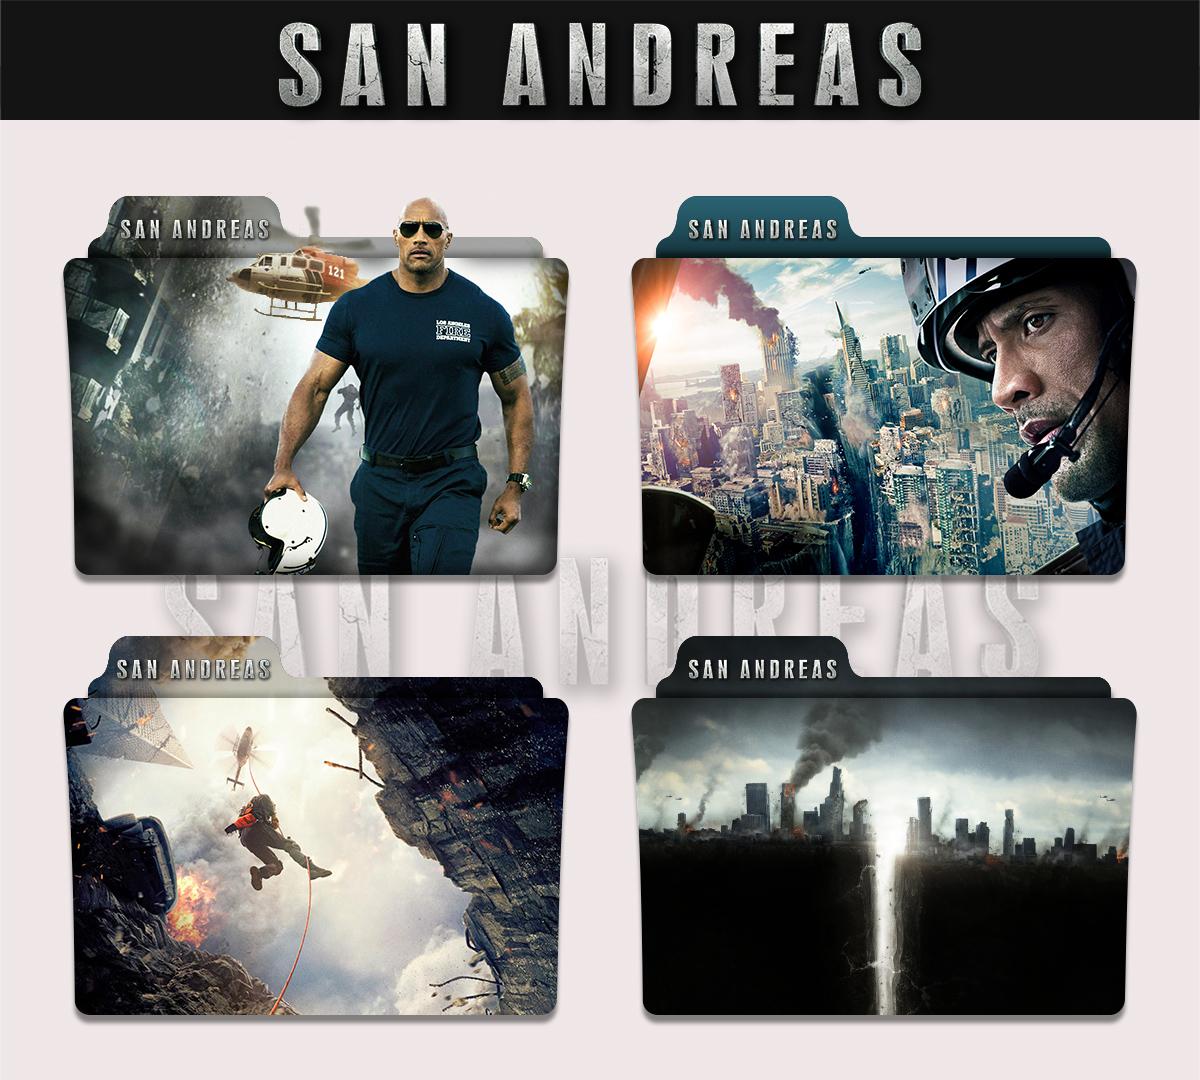 San Andreas 2015 Folder Icon By Sonerbyzt On Deviantart